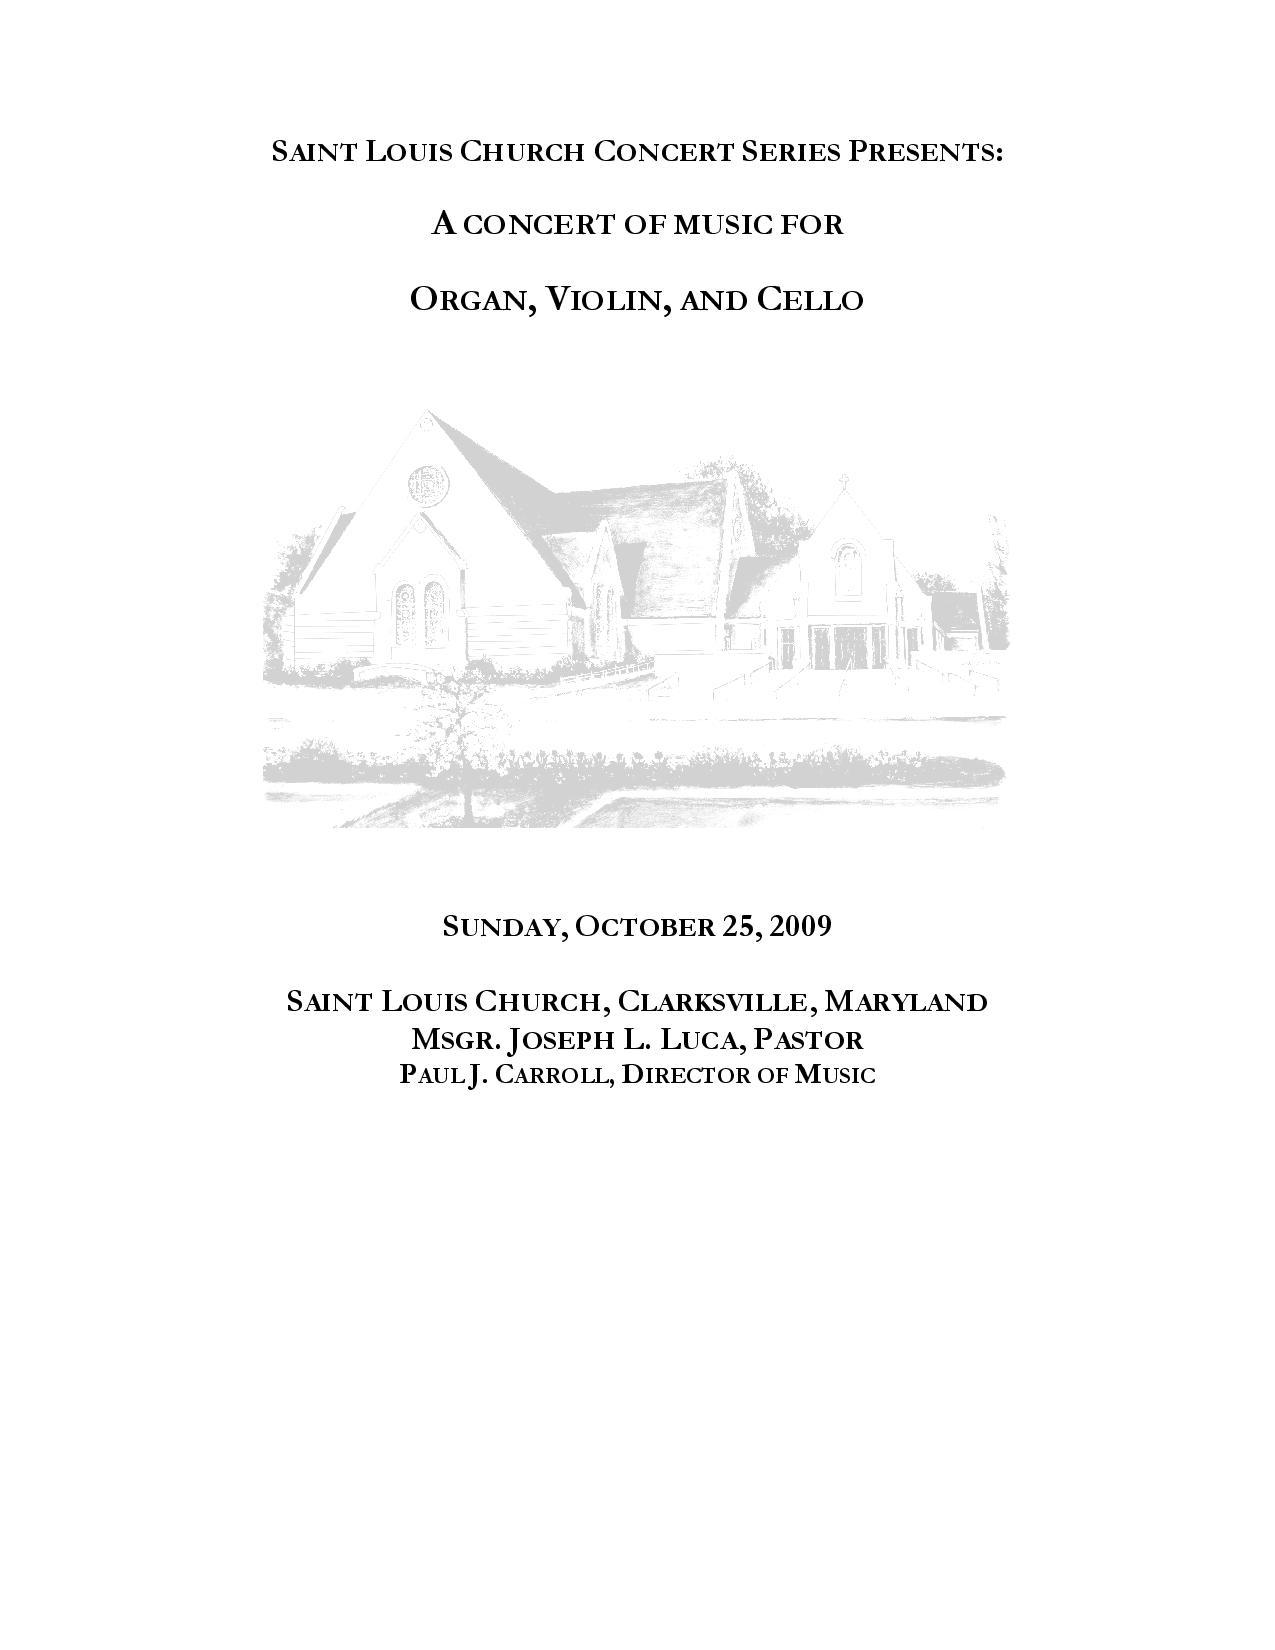 2009-10-25 - Program for Printing-page-001.jpg